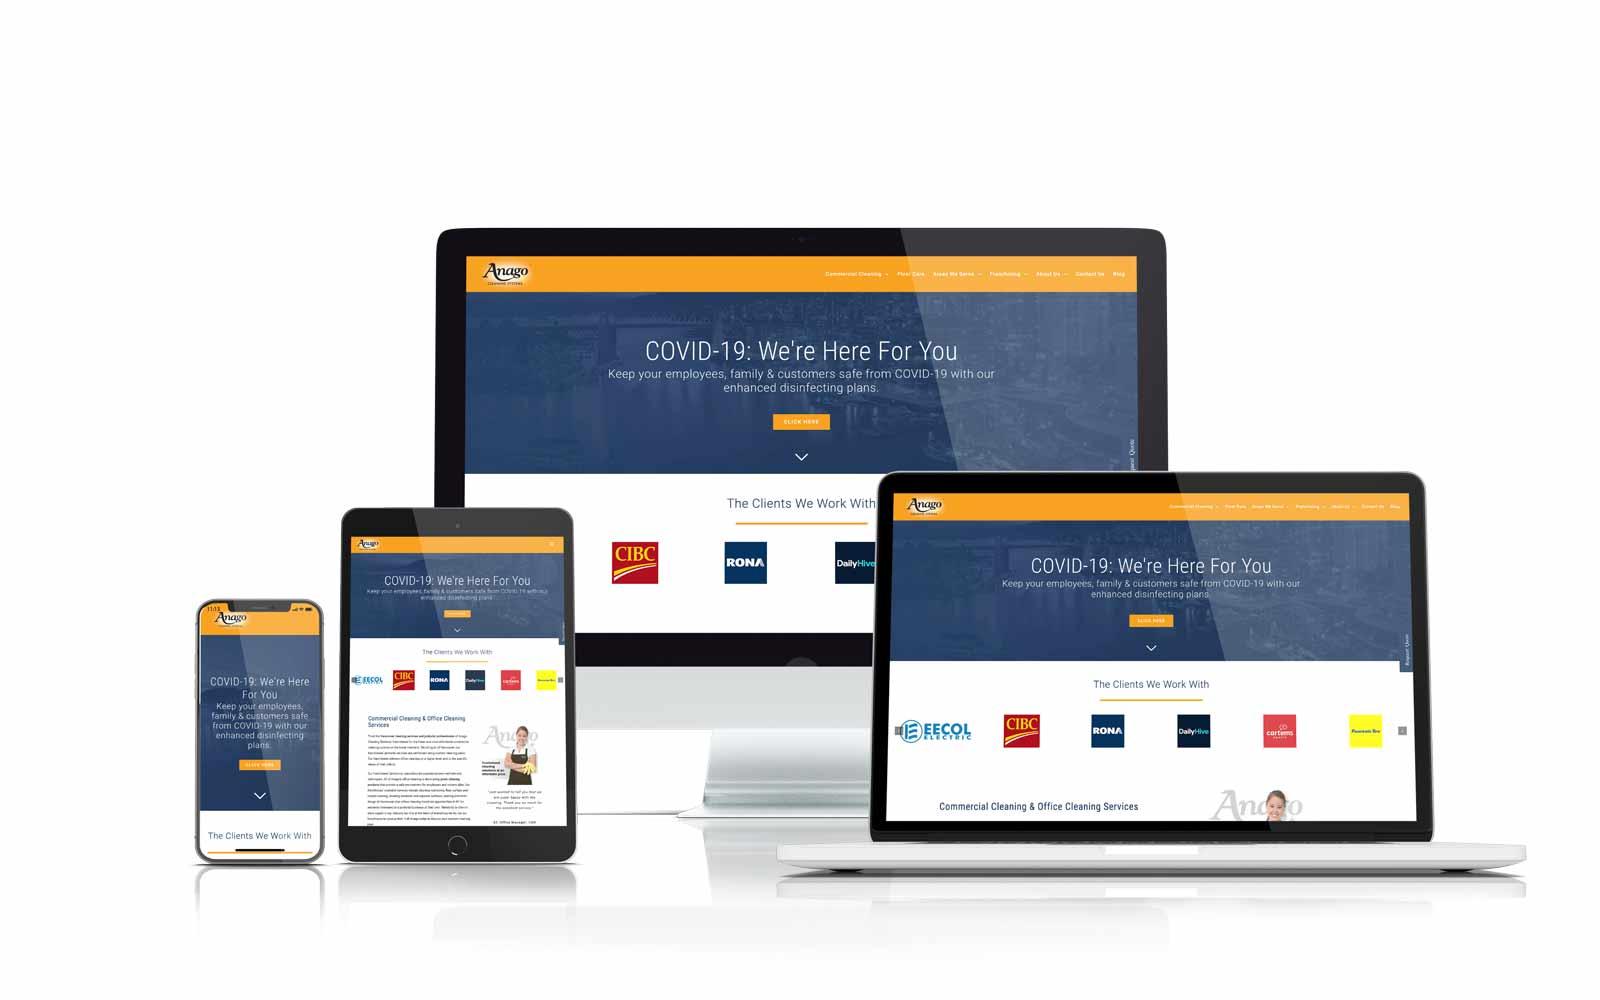 Anago website case study